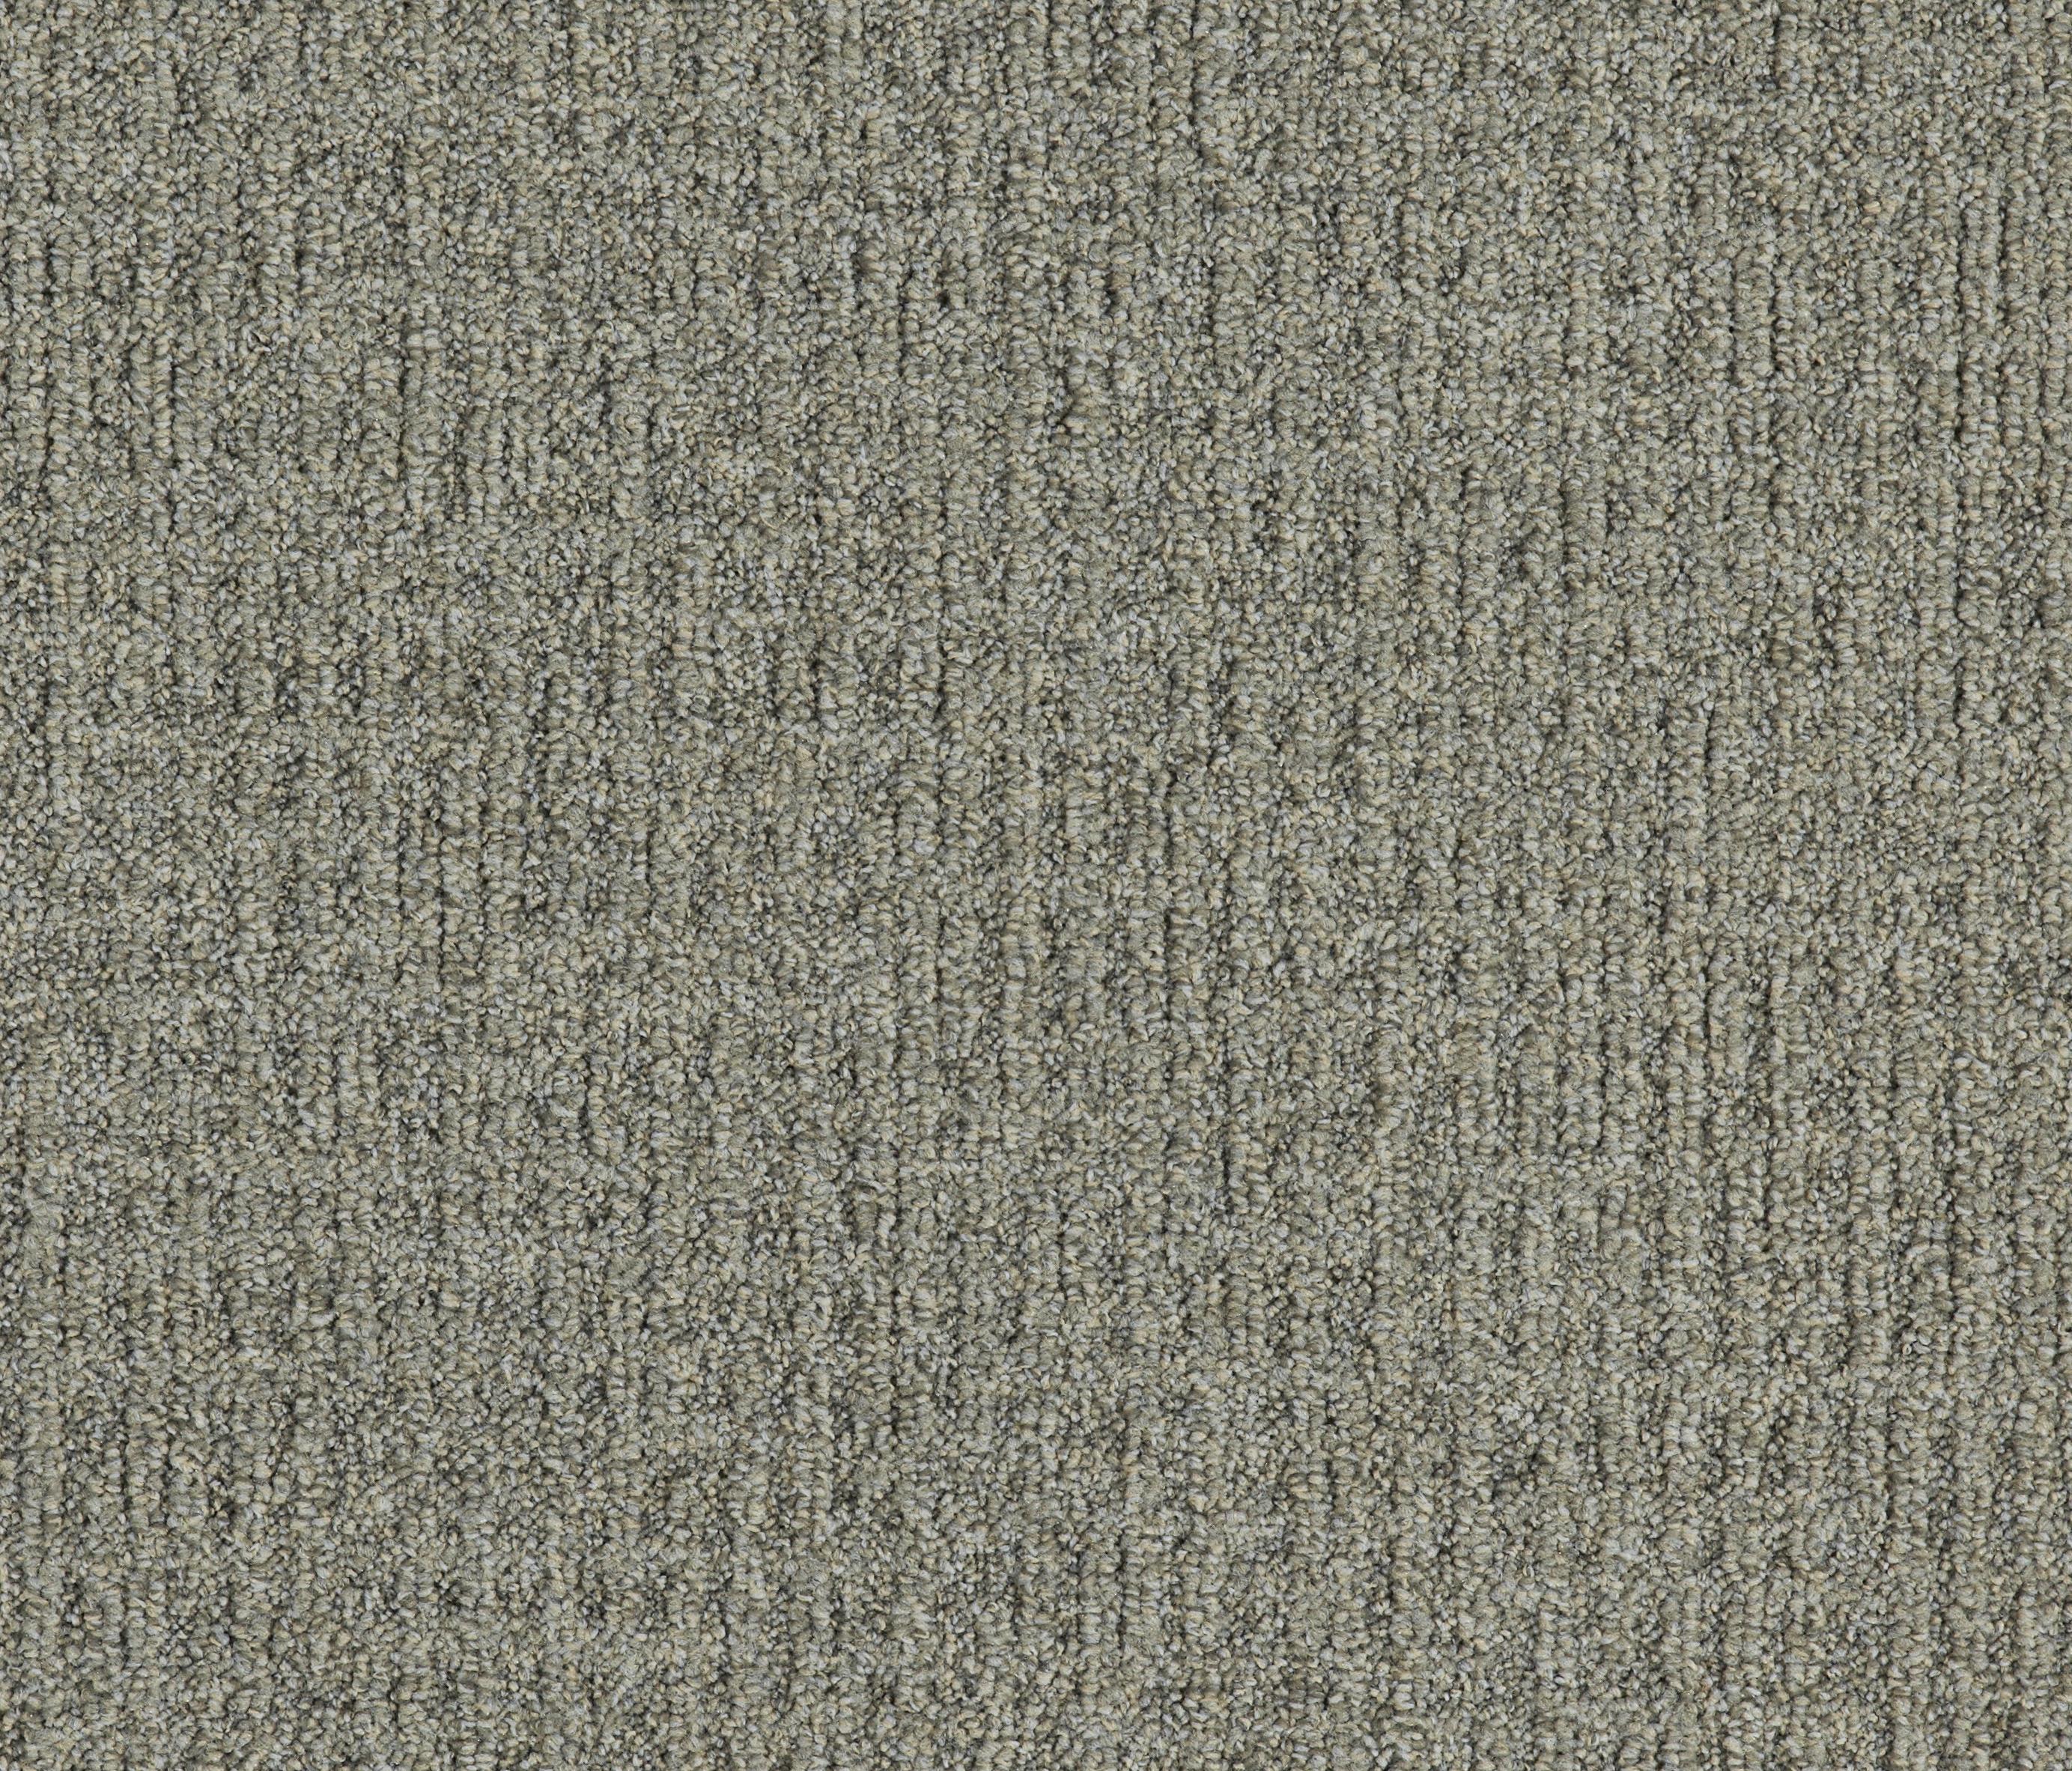 Interface Carpet Tile Pricing Vidalondon